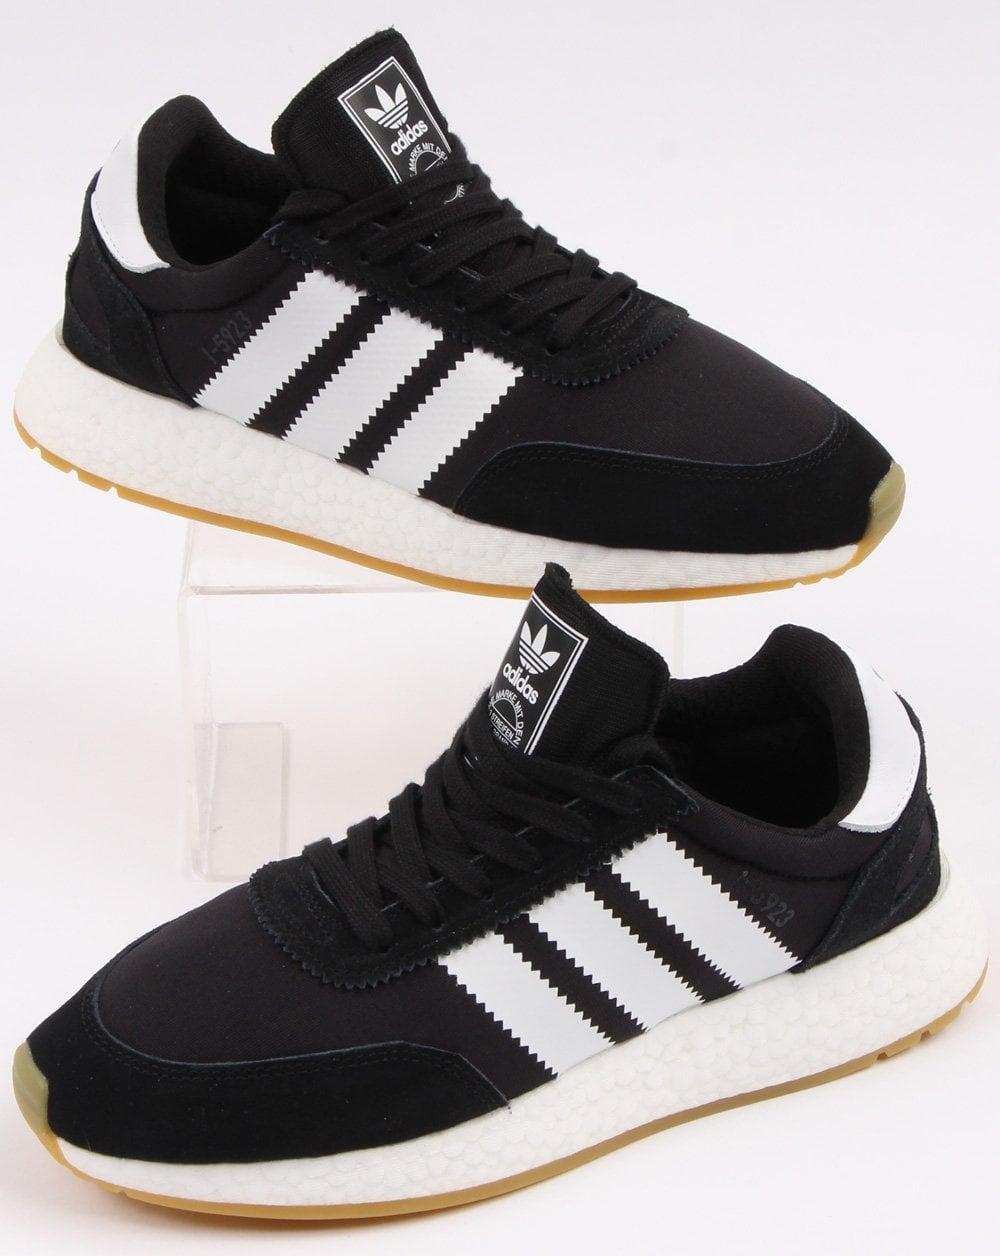 carrera Mayor Retirarse  Adidas I-5923 Trainers Black/White - Shop Adidas At 80s Casual Classics